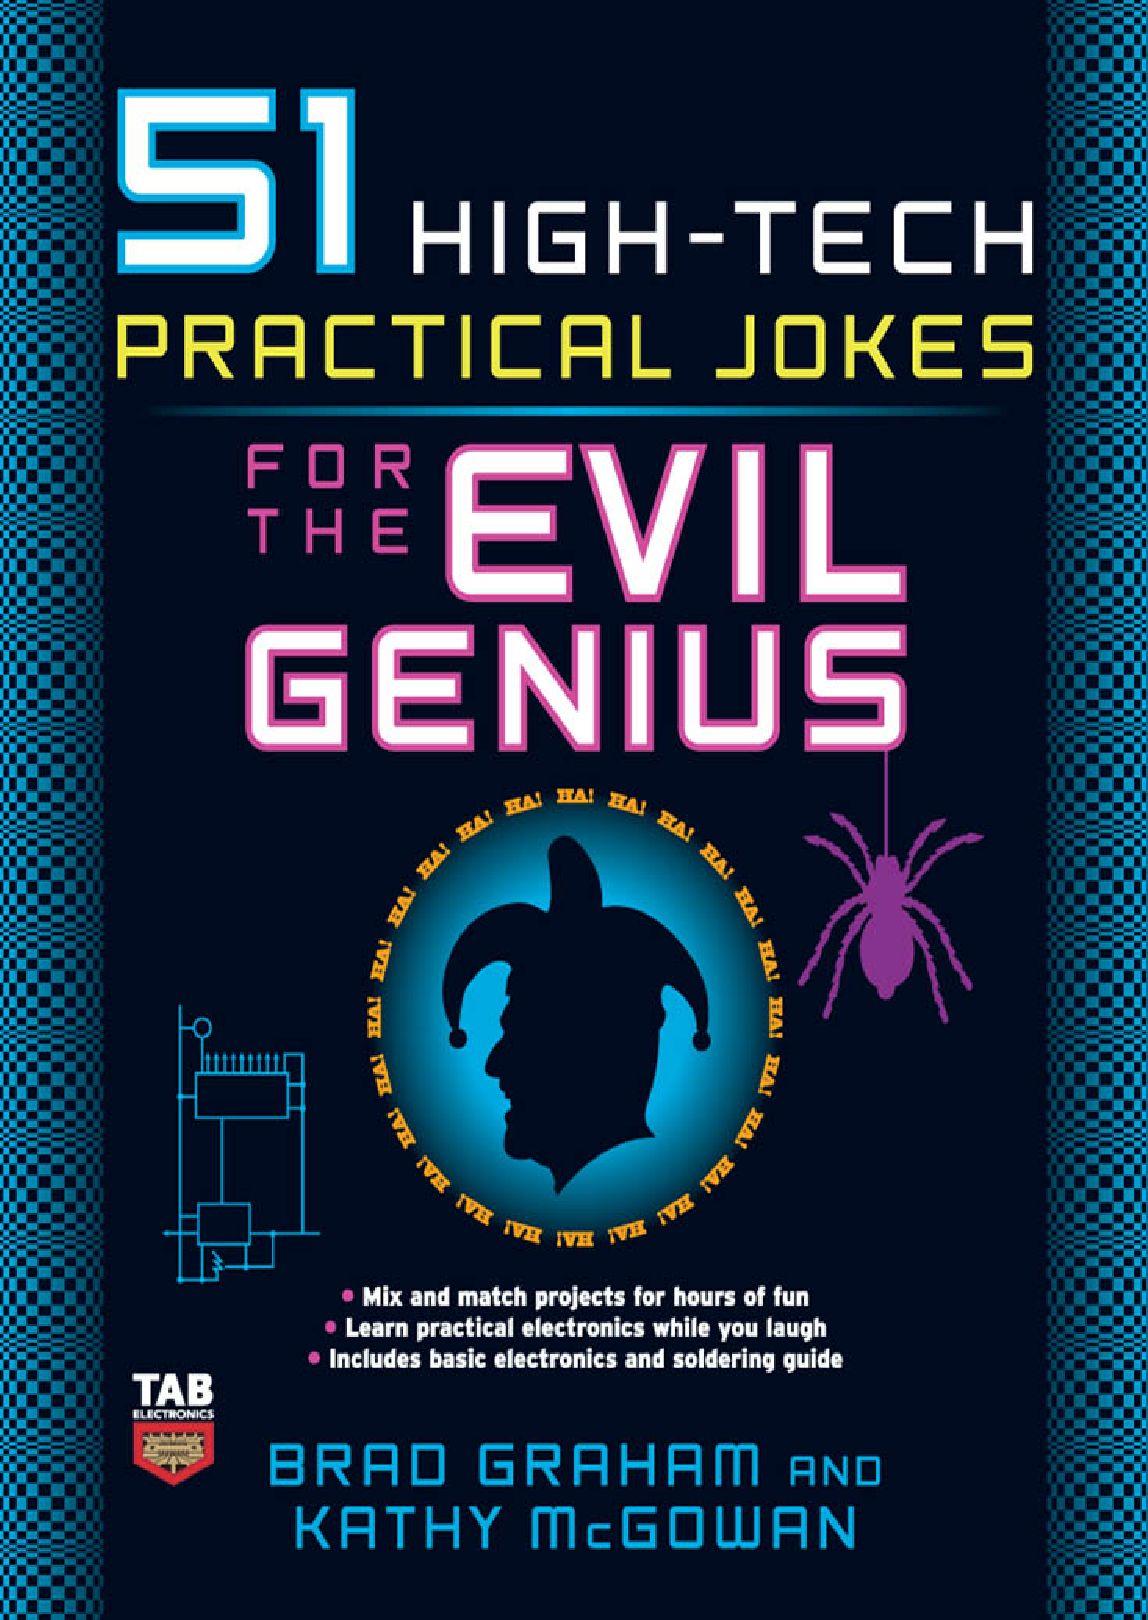 51 High Tech Practical Jokes For The Evil Genius By Jake Jutson Issuu Circuit Simulator 555 Internals